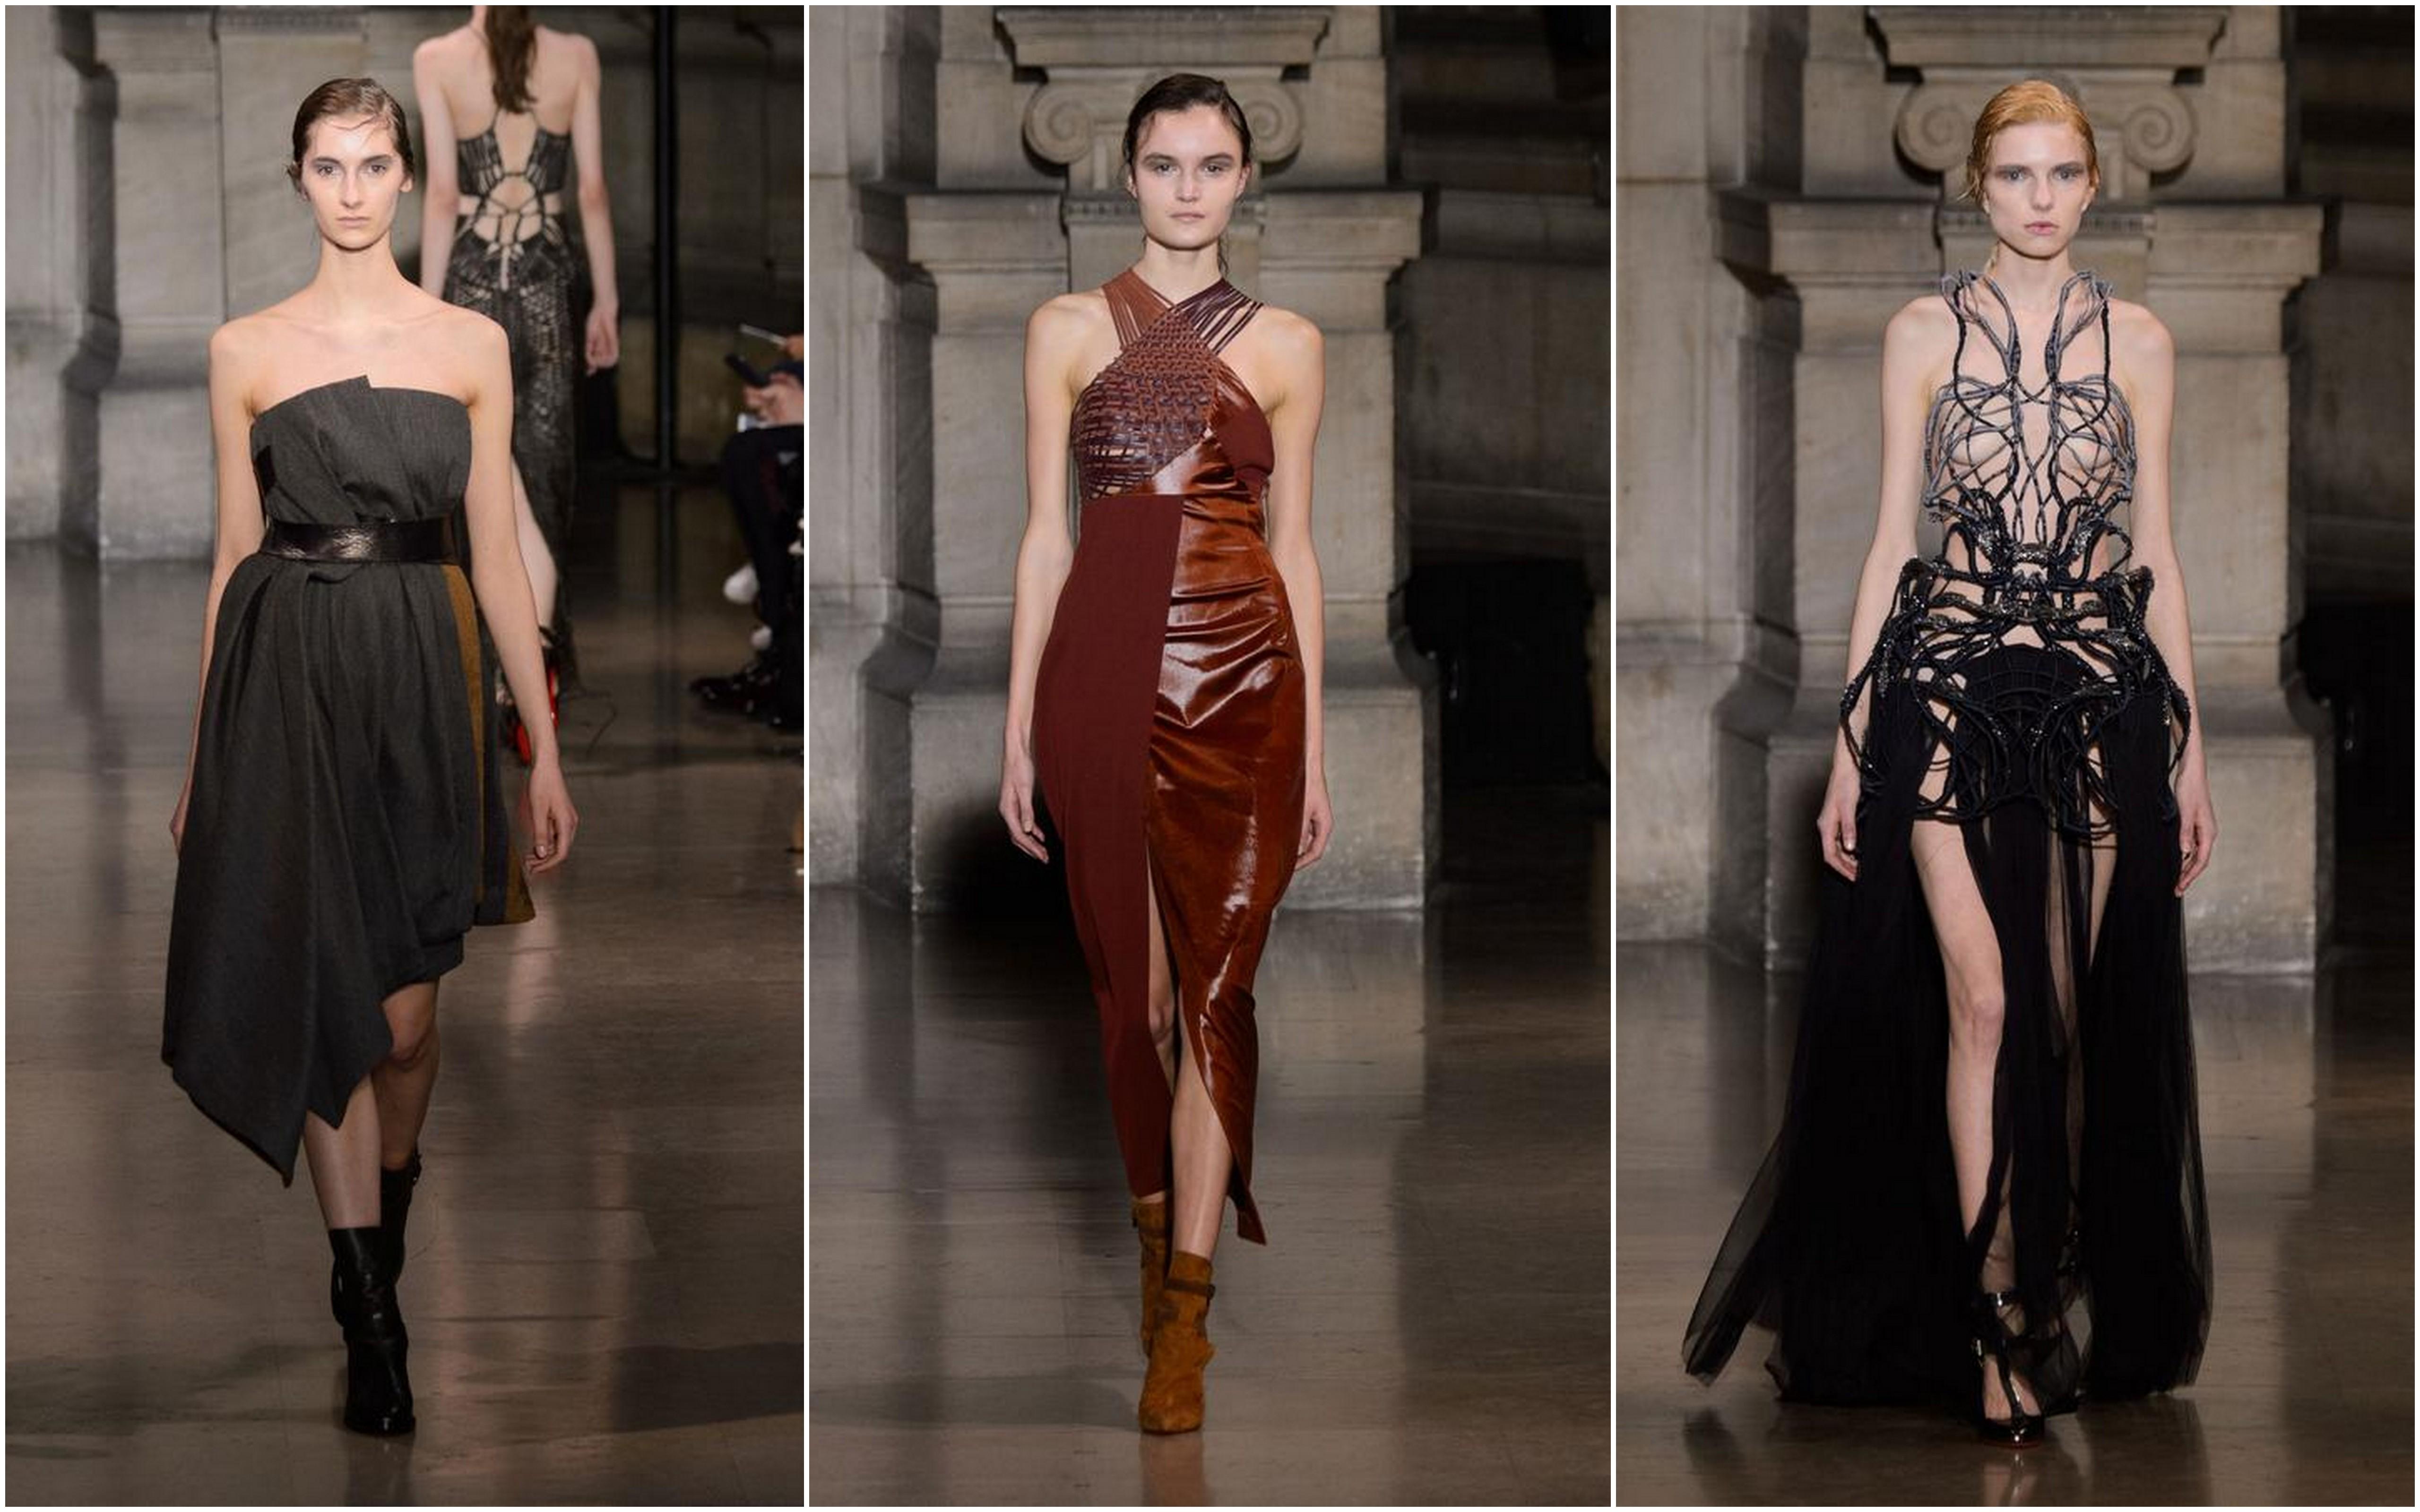 La balade couture de Christian Louboutin | Maryo's Bazaar